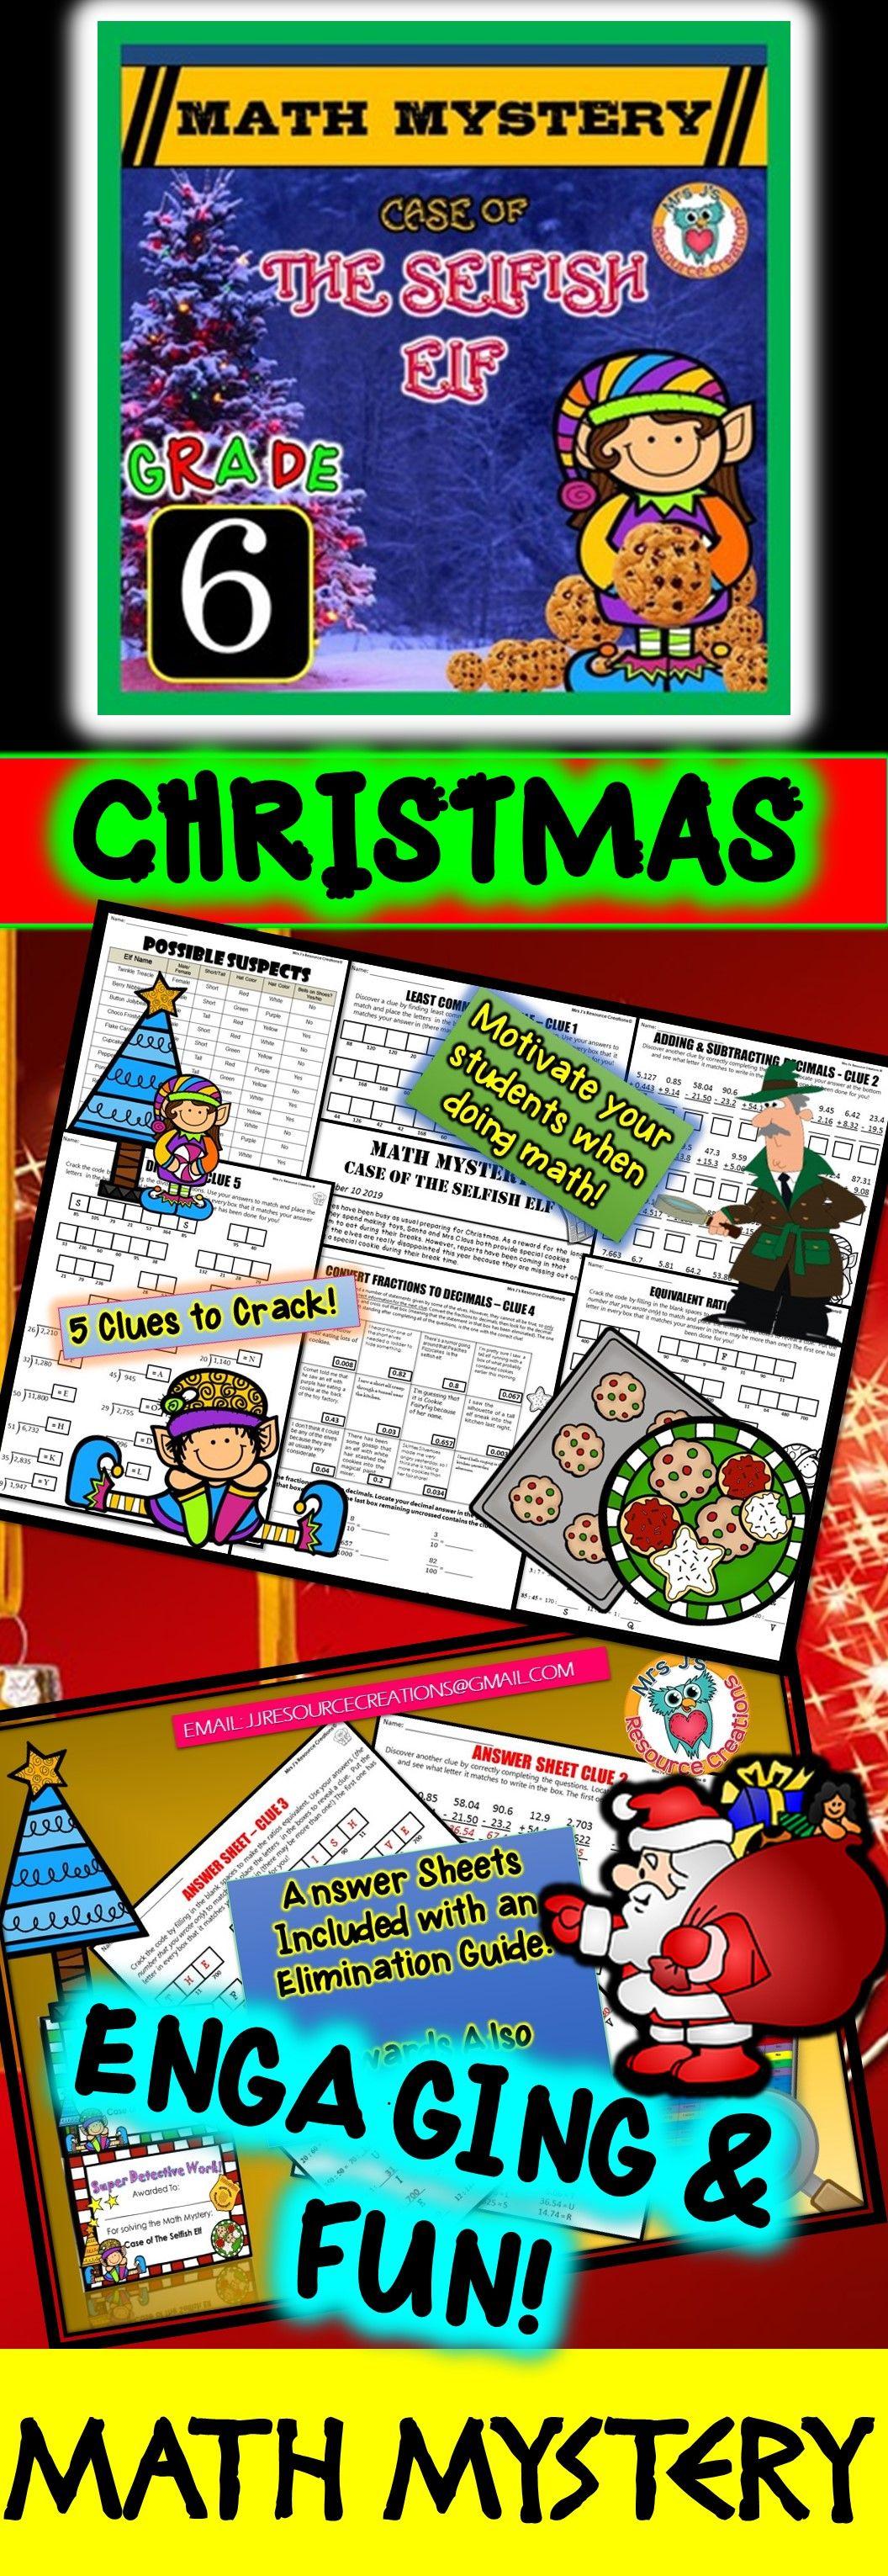 Christmas Math Challenge 3c Answers